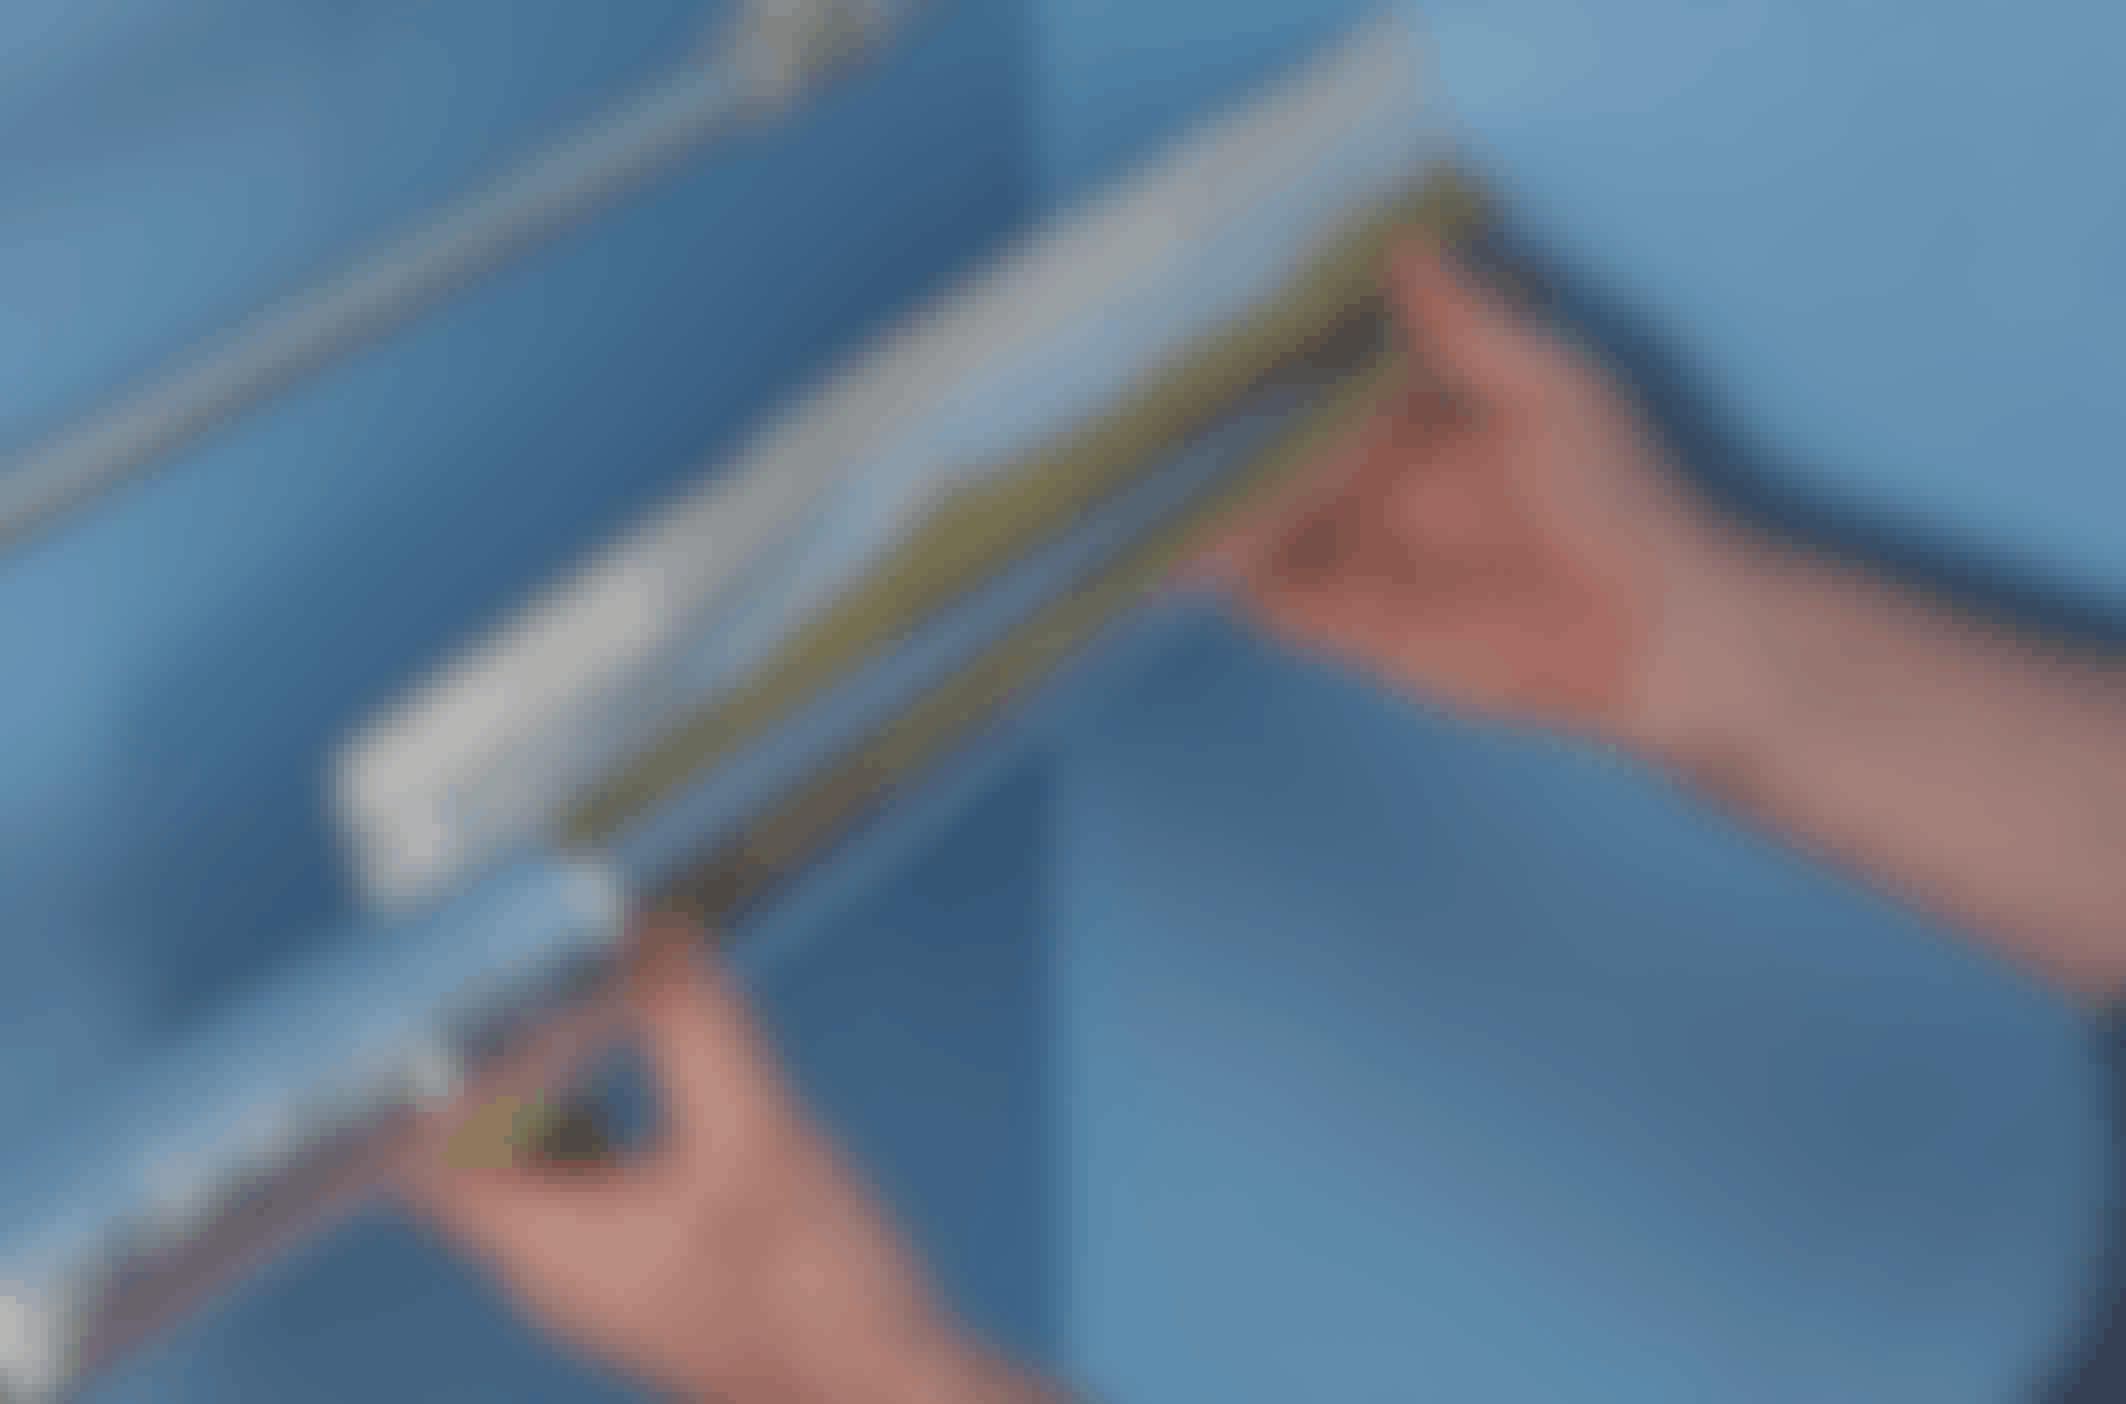 Rørisolering - den enkleste besparelsen